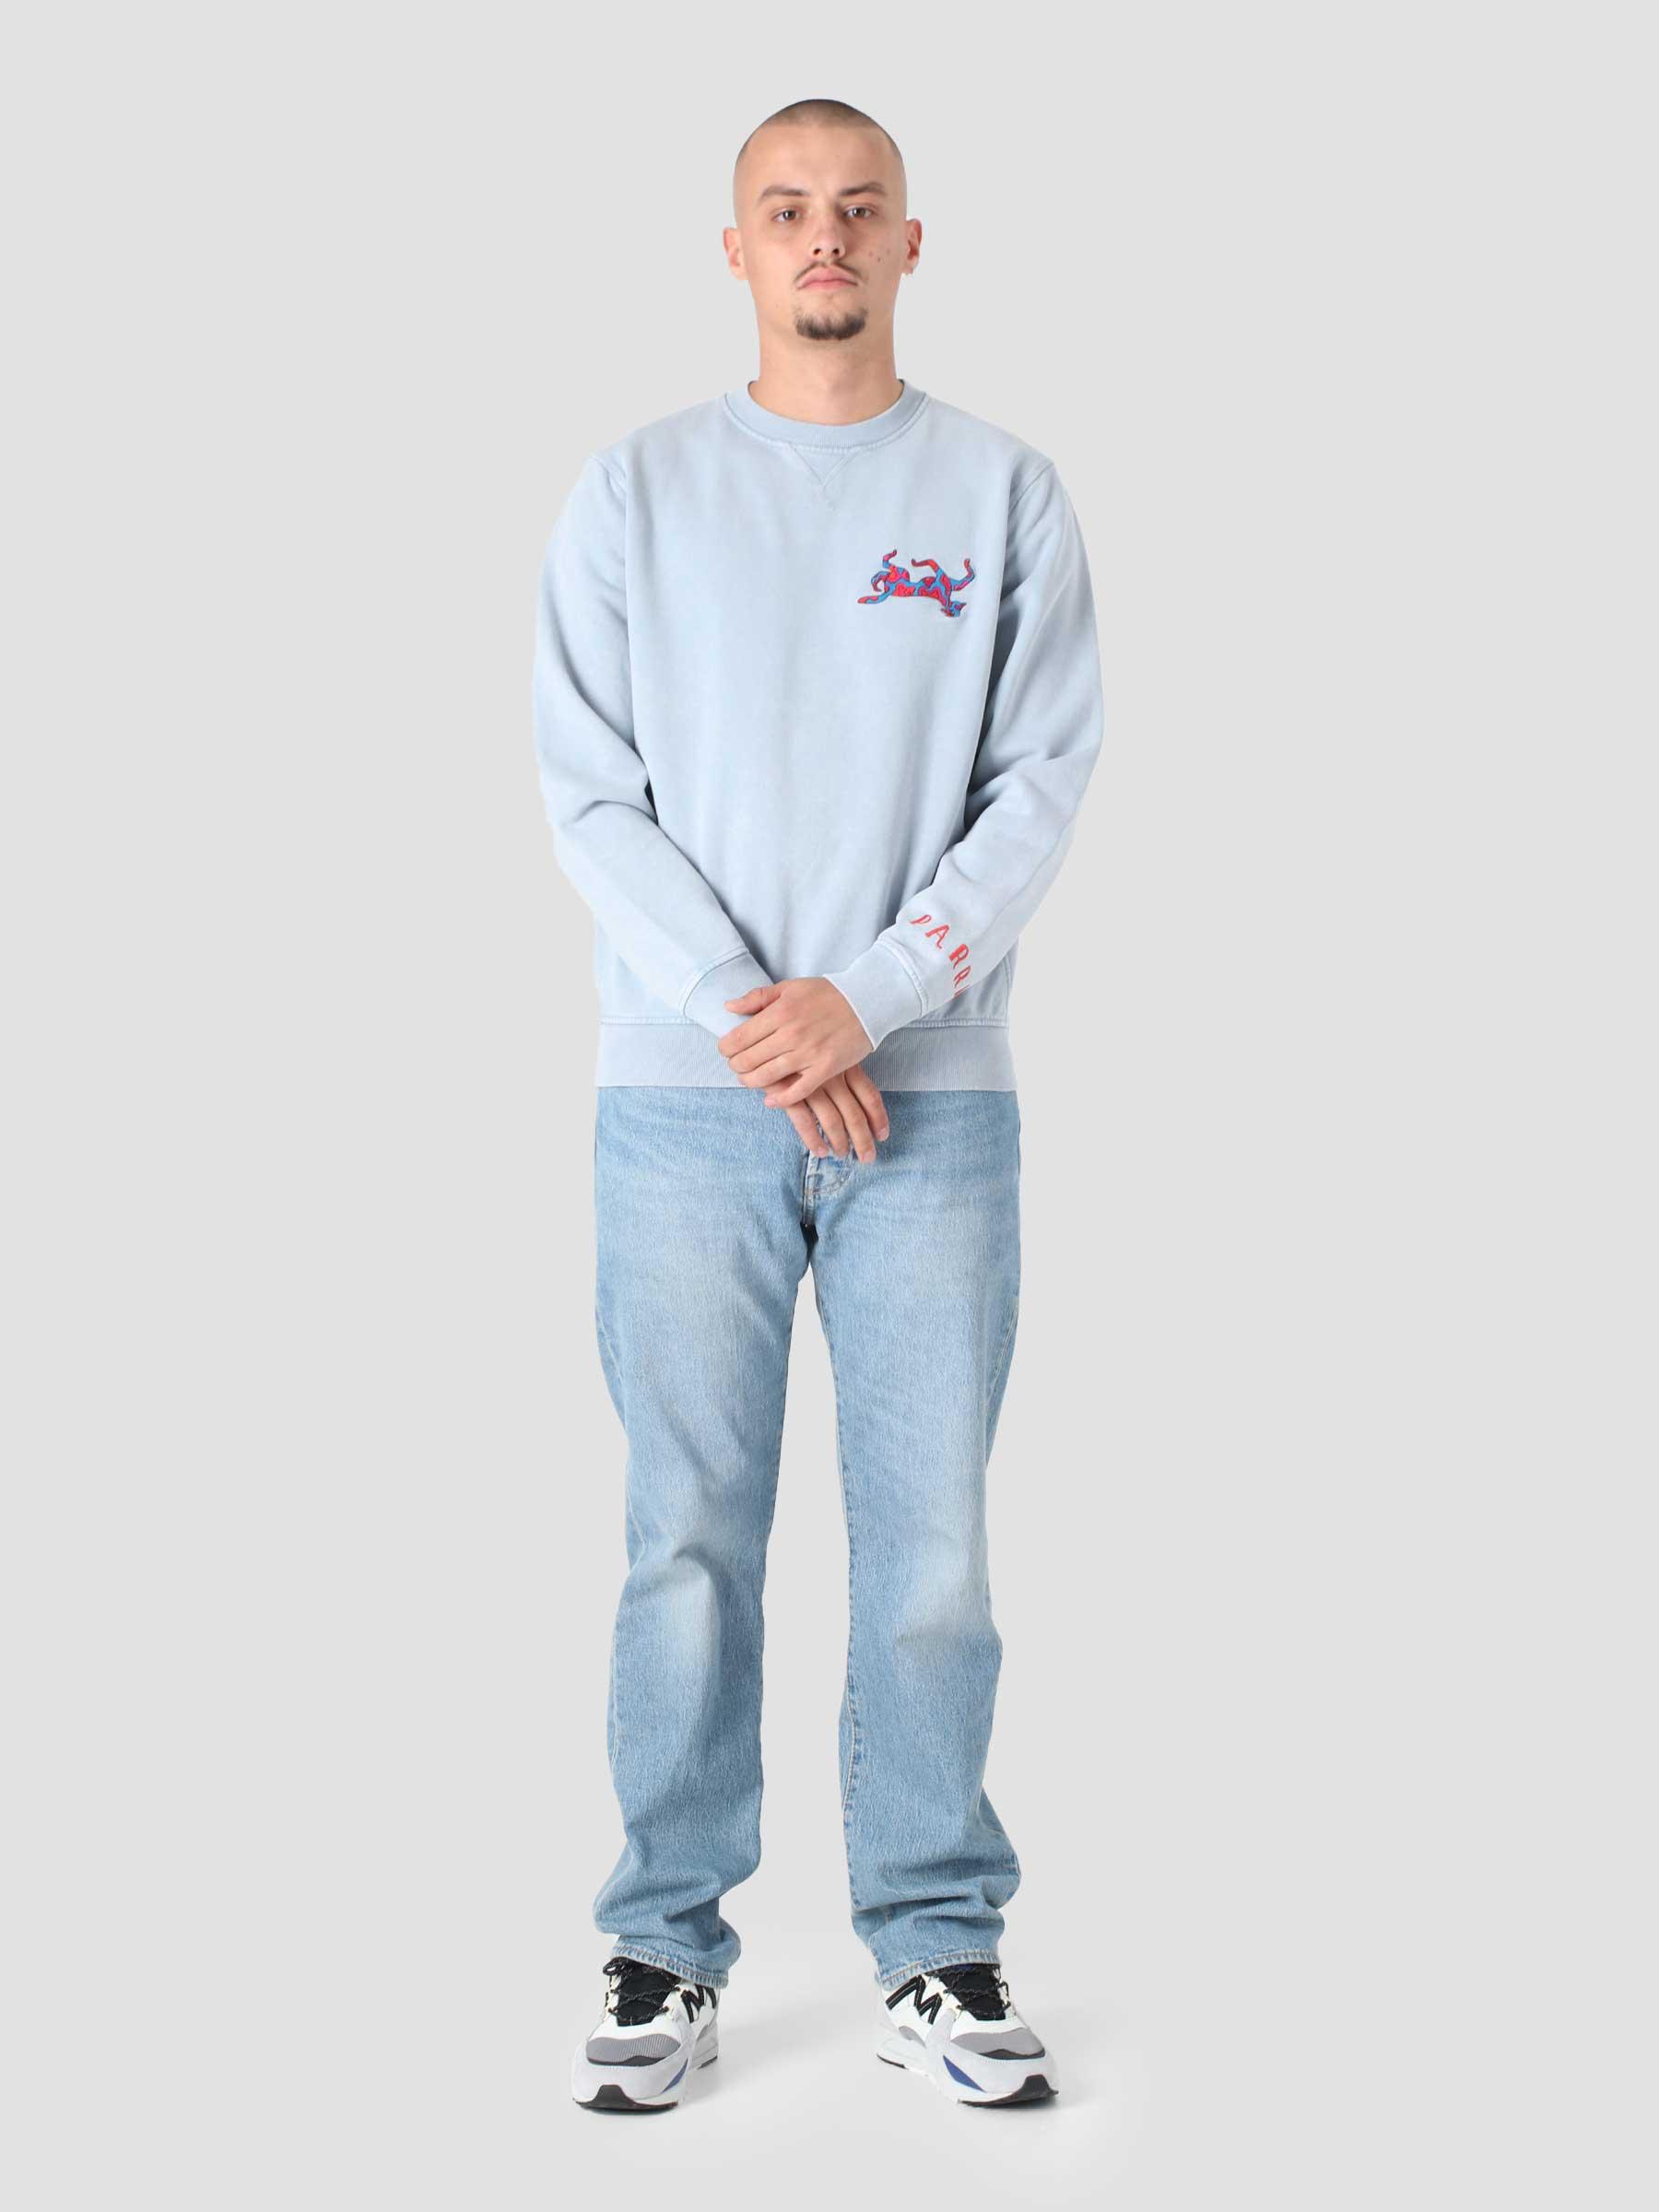 Upside Dog Race Crewneck Sweatshirt Dusty Blue 46320